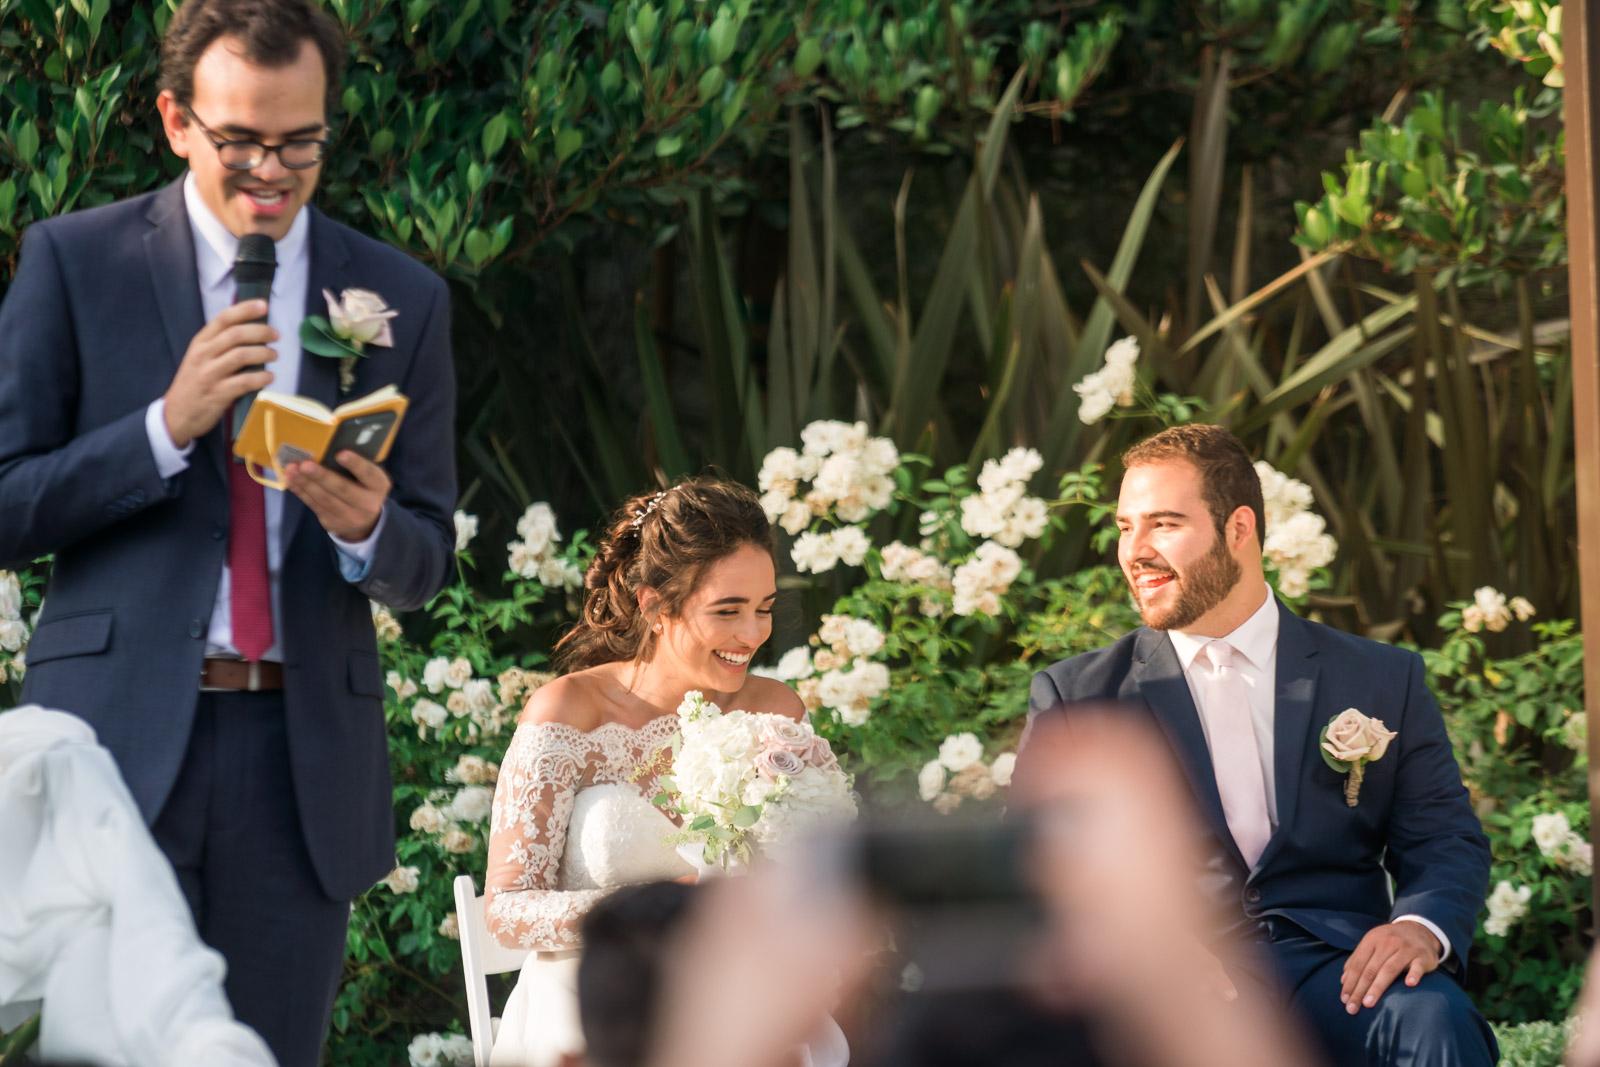 161_Angel-Brea-Orange-County_Joseph-Barber-Wedding-Photography.jpg